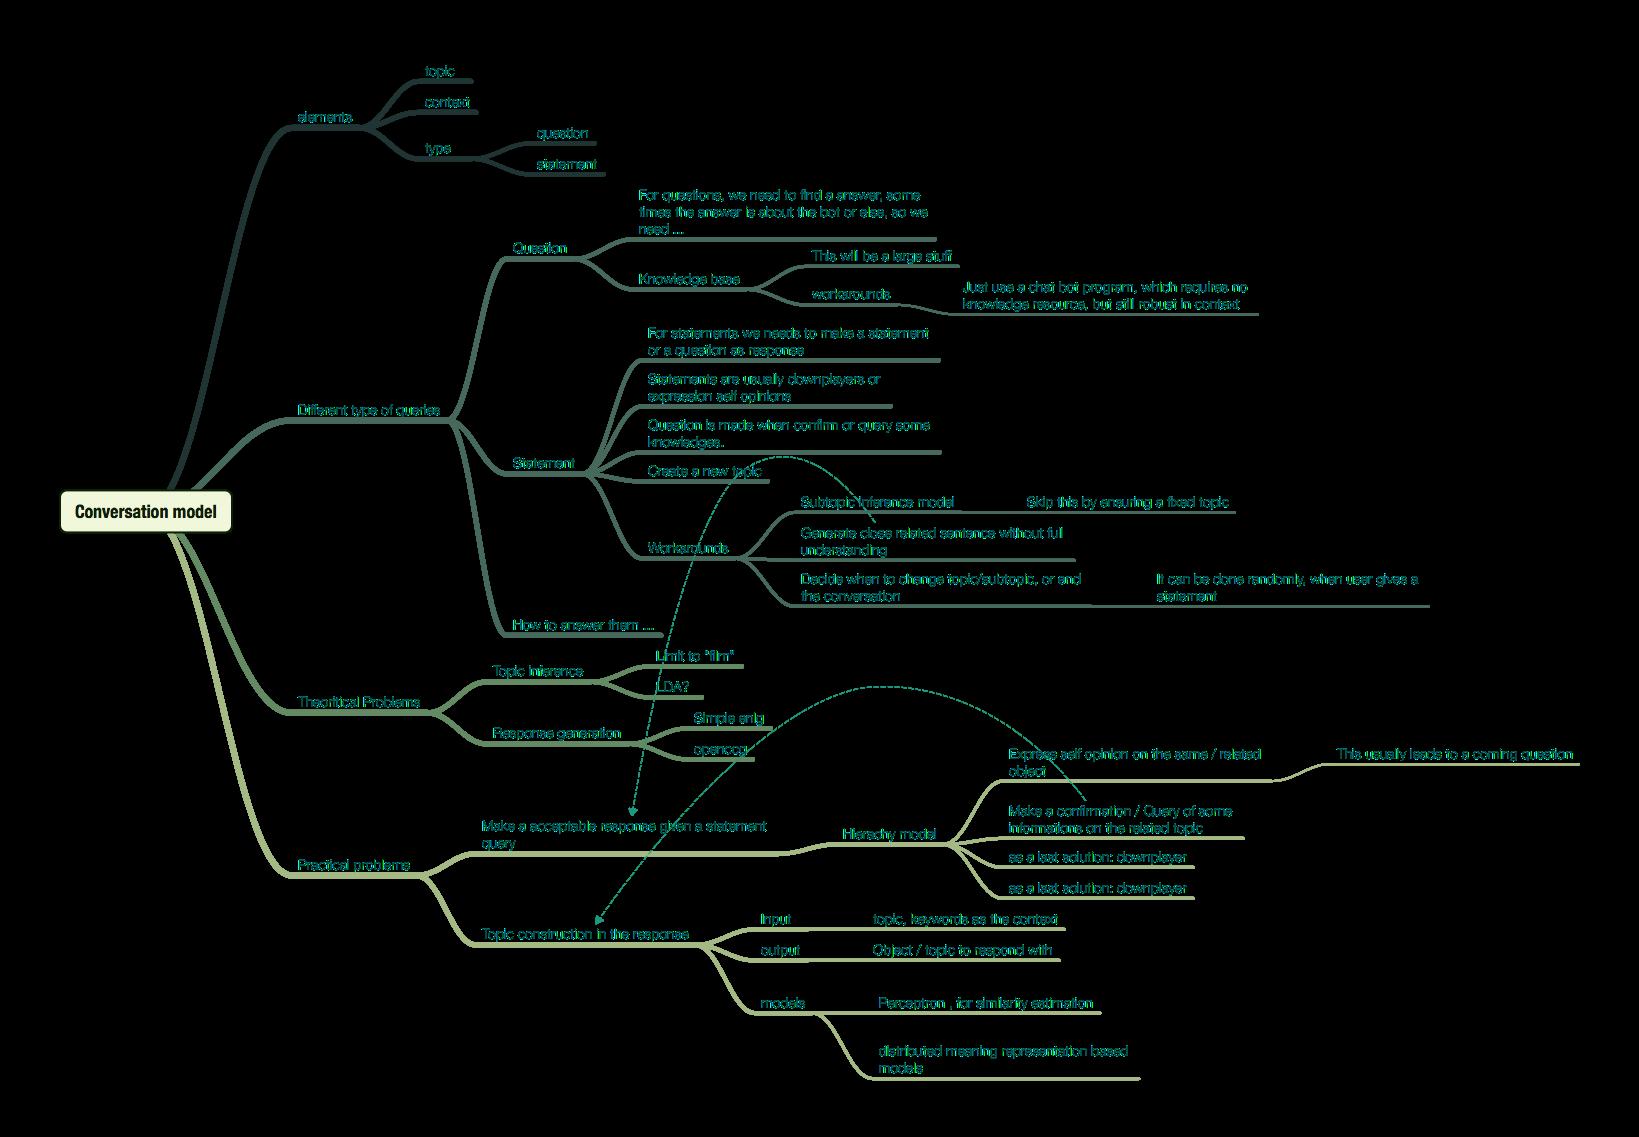 conversation model mindmap